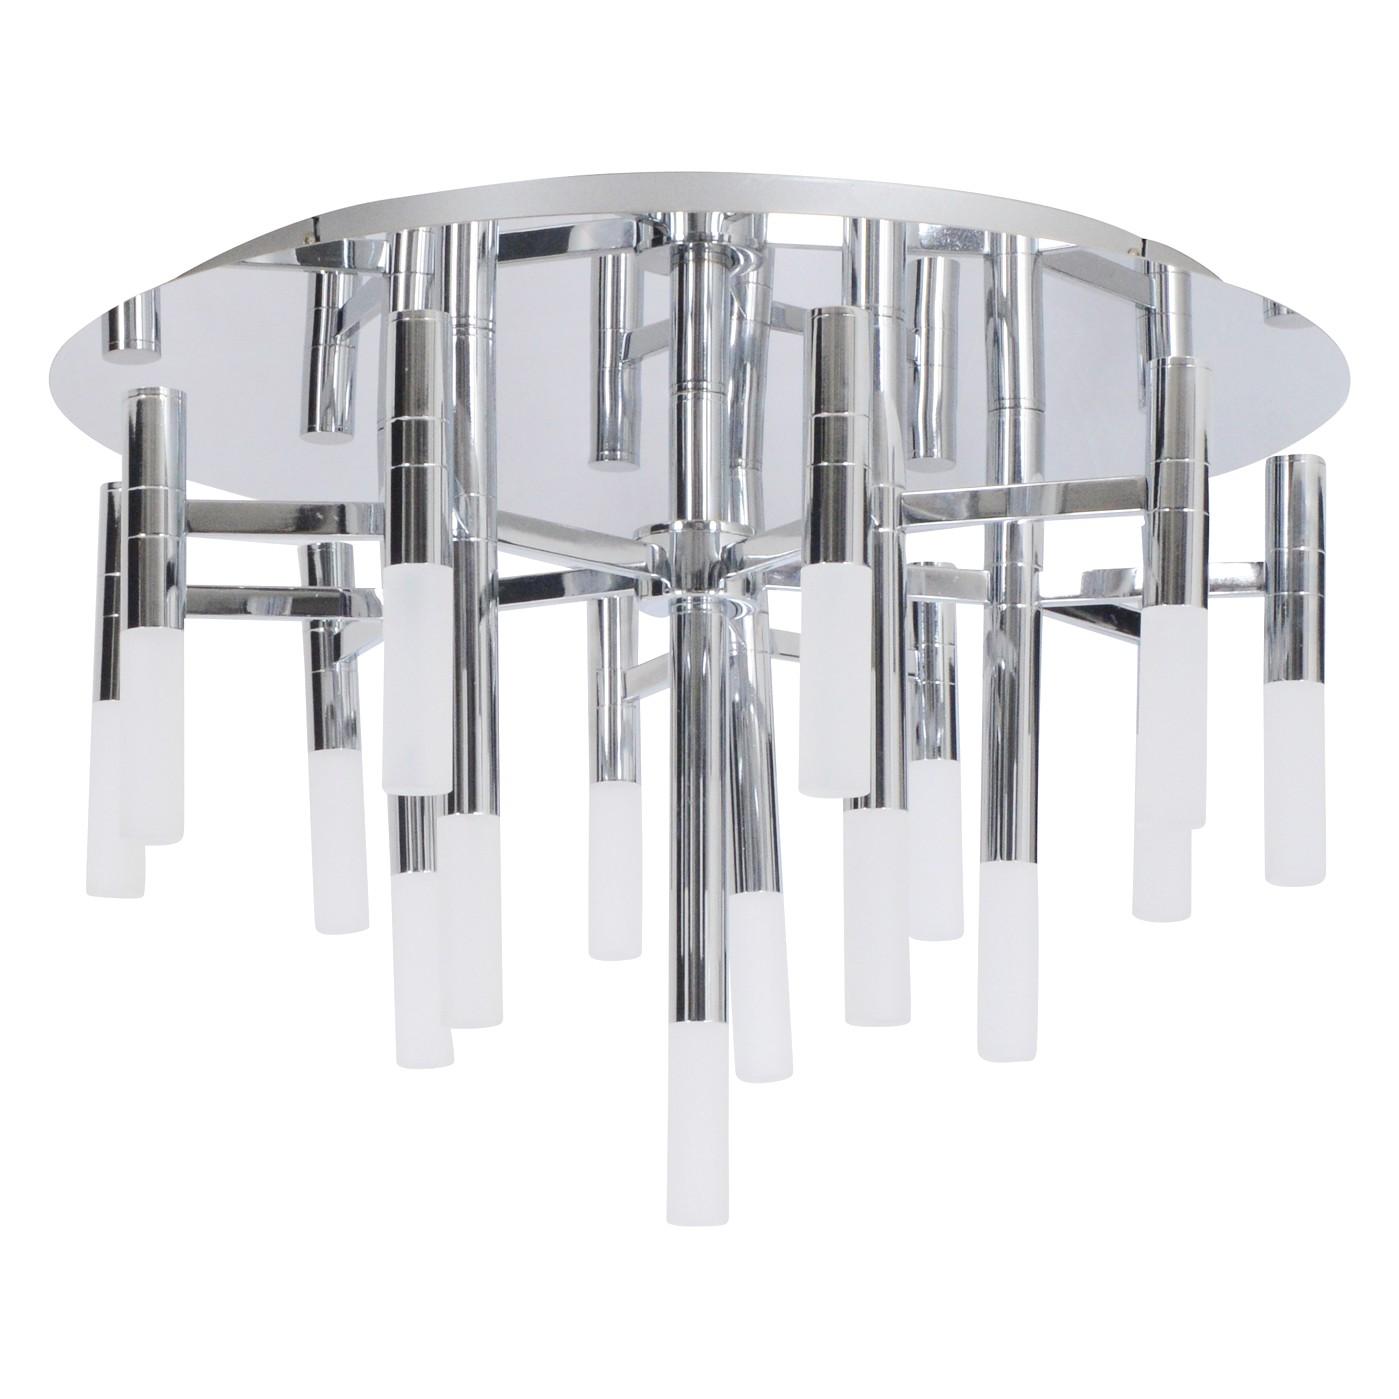 LED-Deckenleuchte Candle